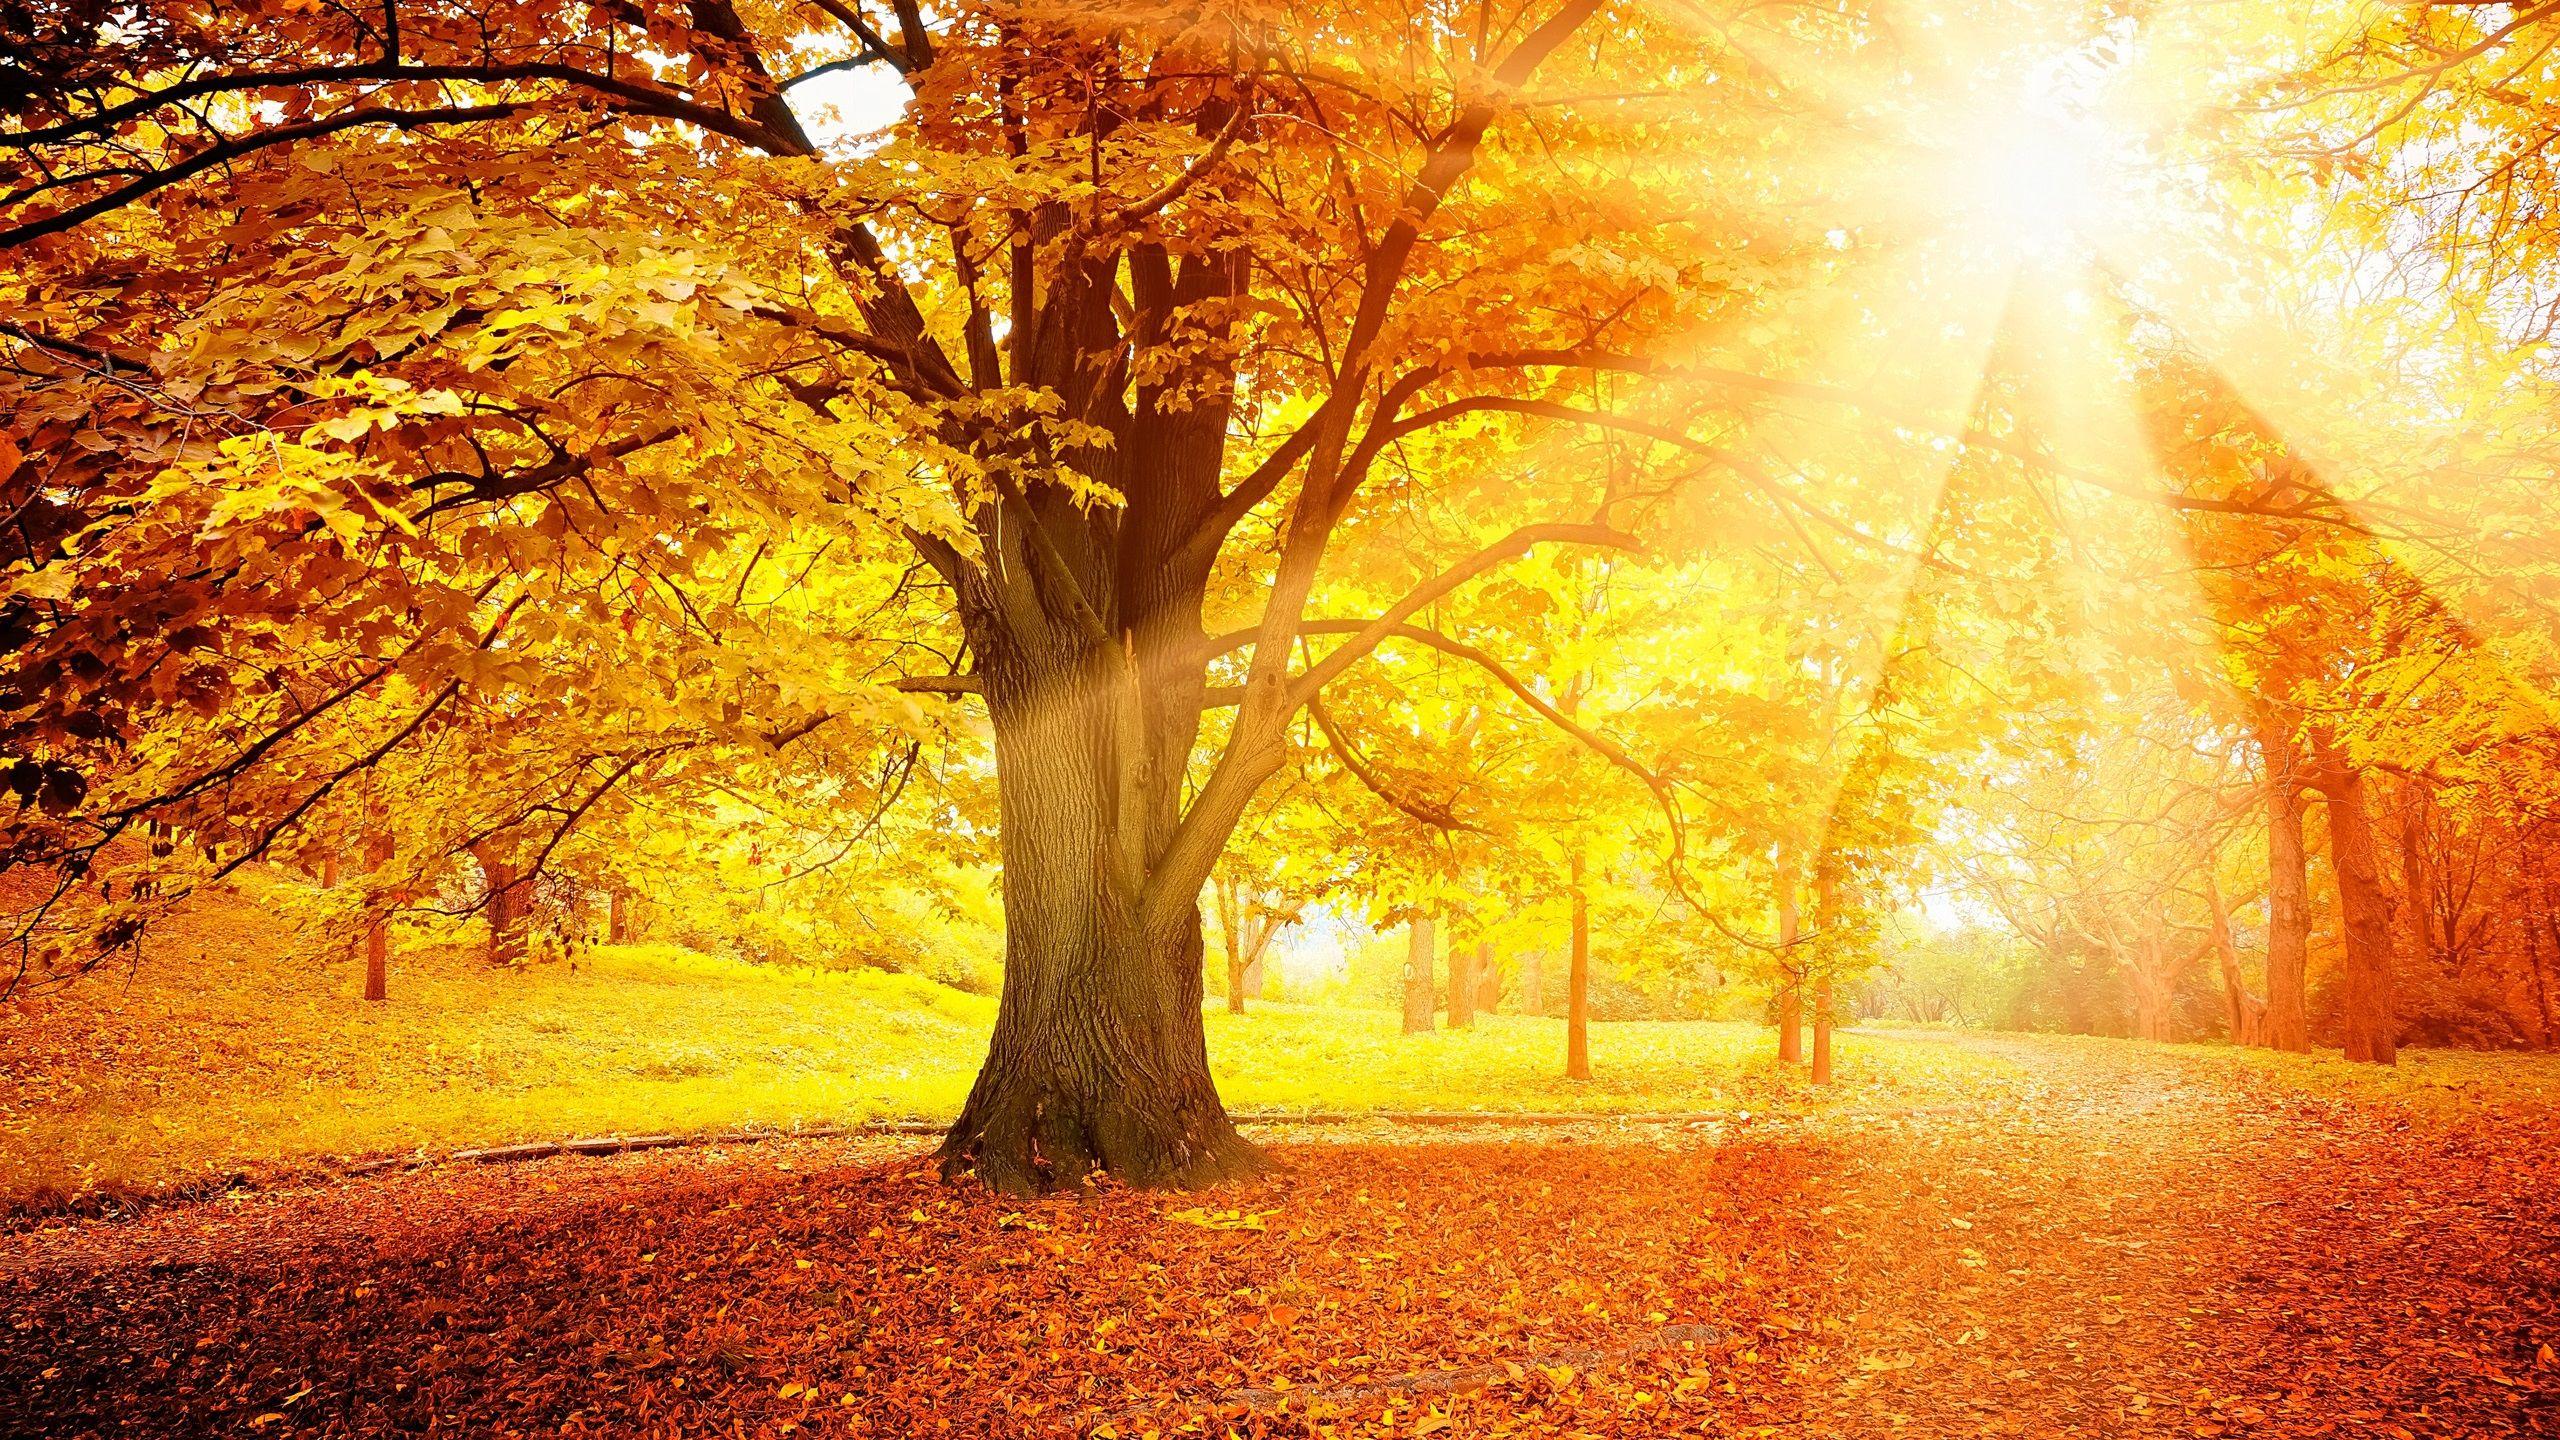 Solar Autumn Sunset Summer Painting Fall Wallpaper Autumn Forest